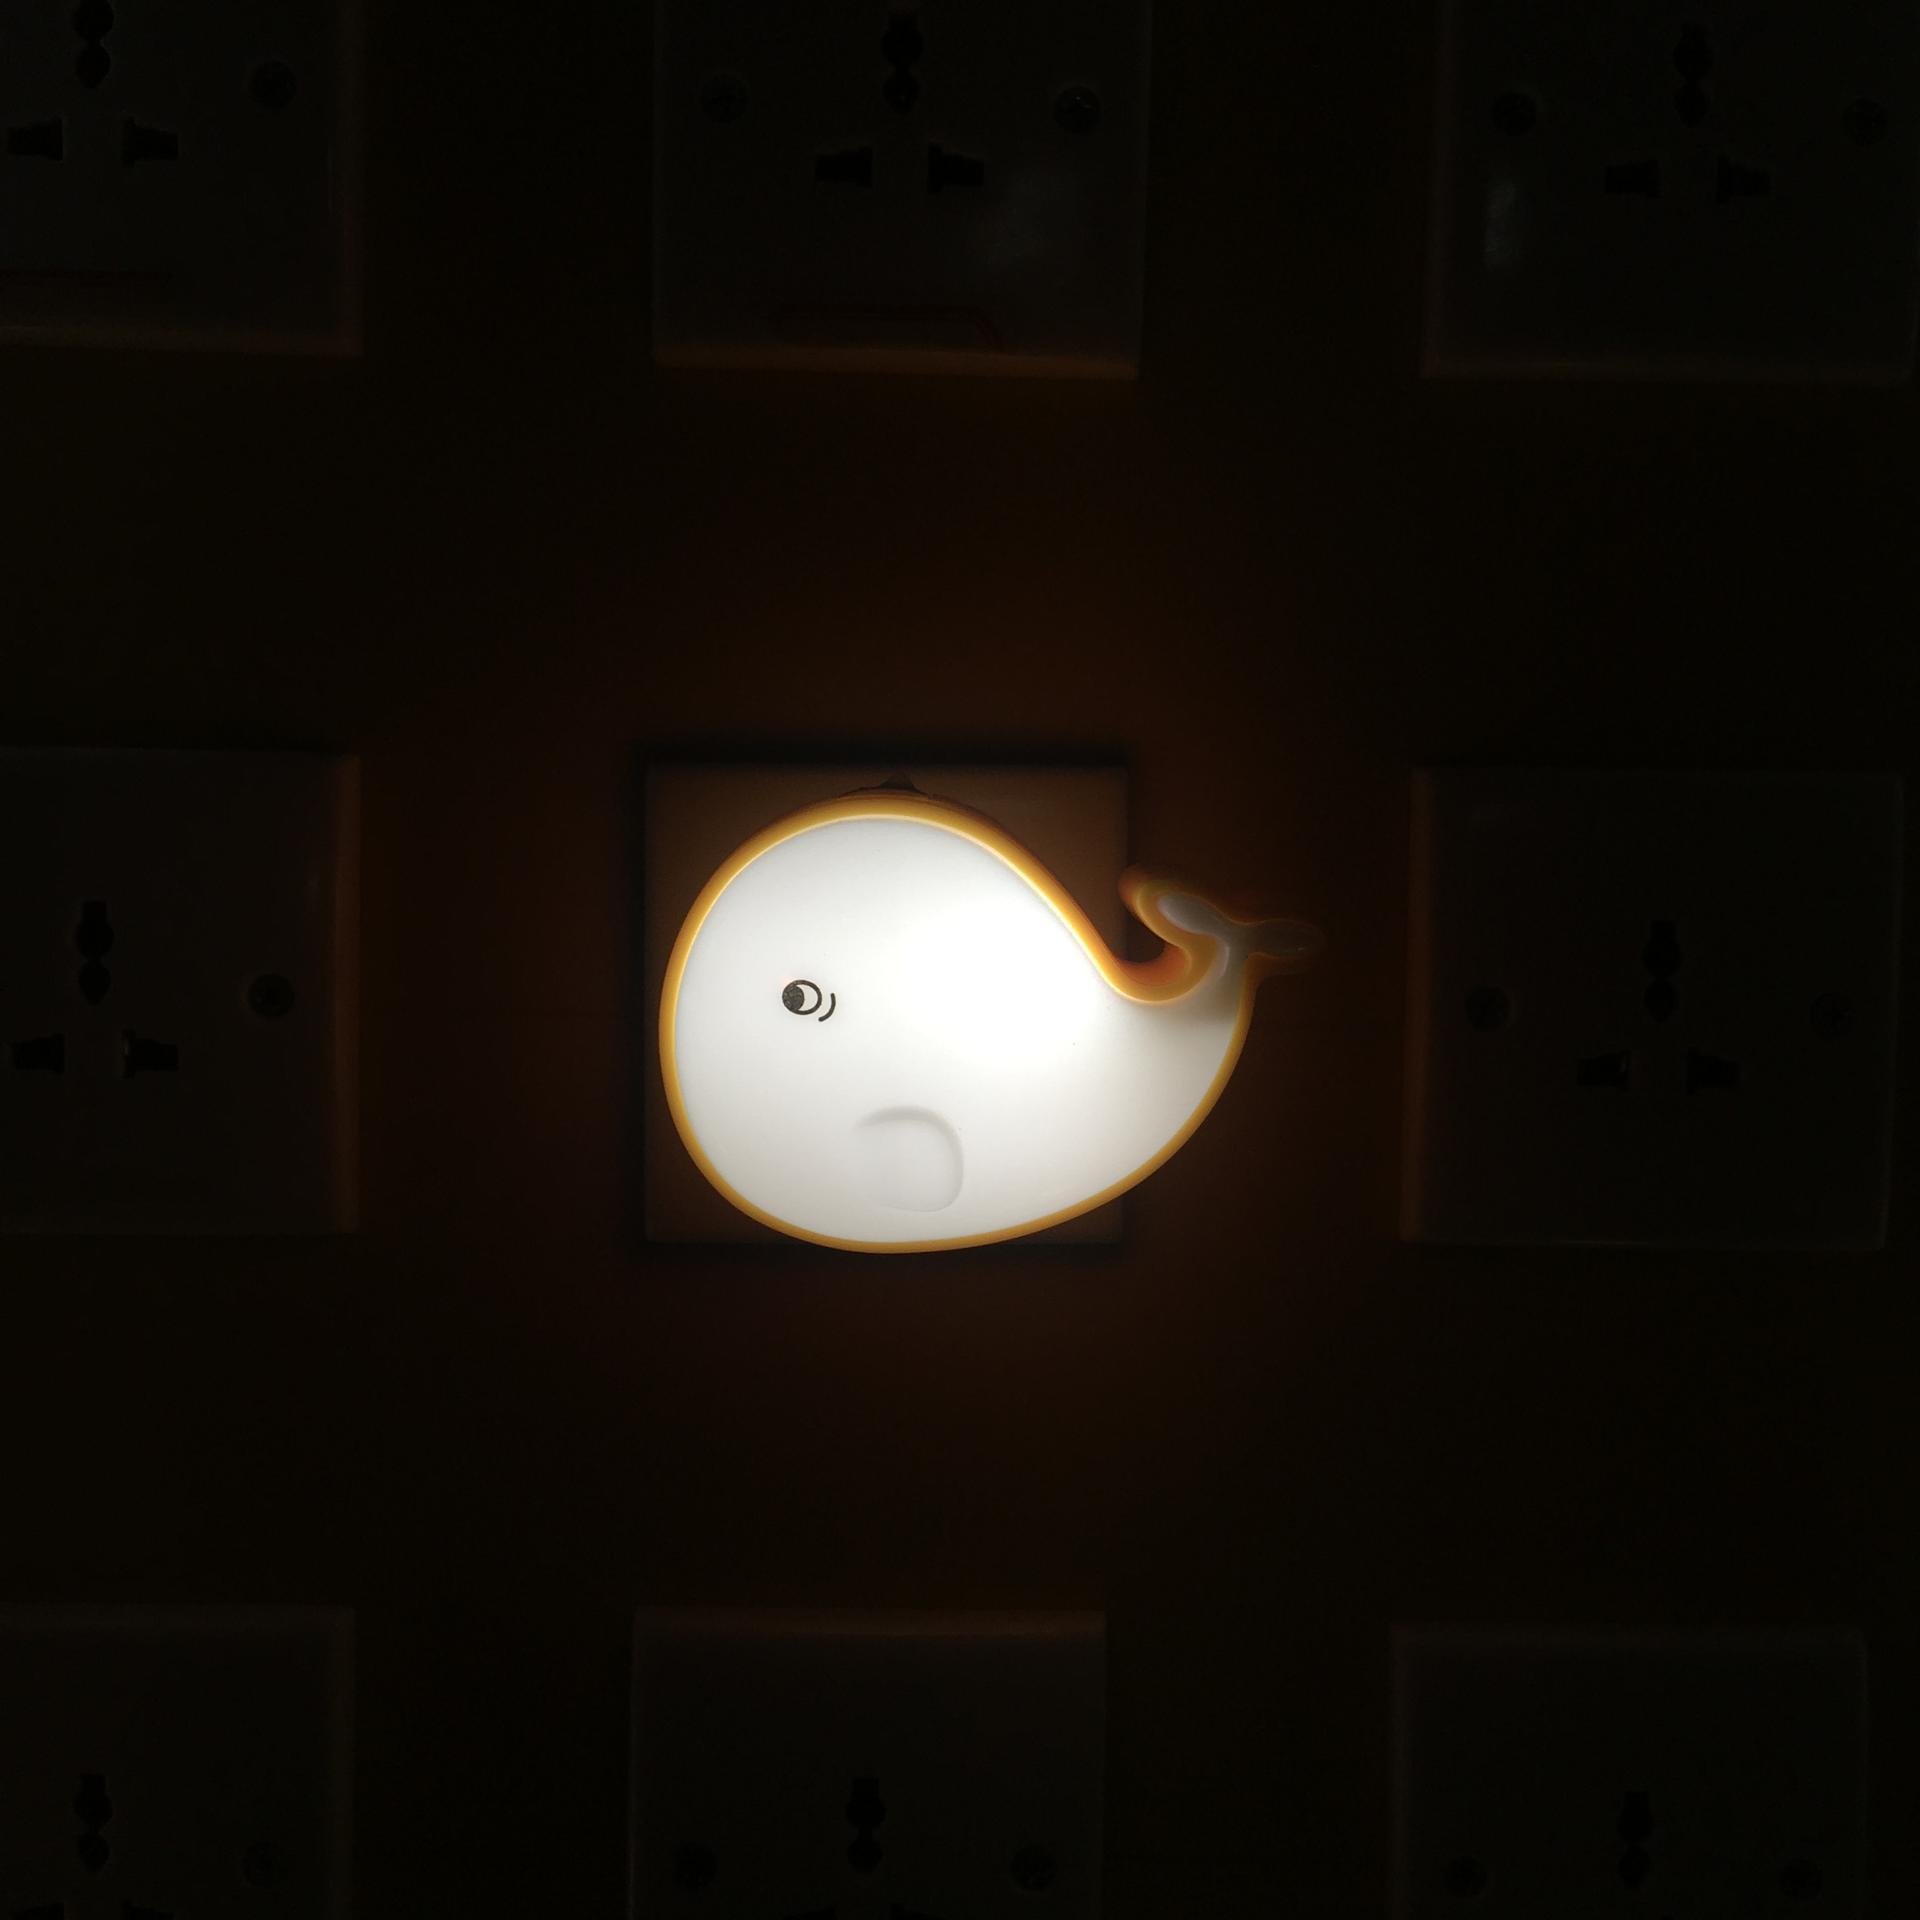 OEM 0.6W AC 110V or 220V W045 The whale shape 3SMD mini switch plug in night light